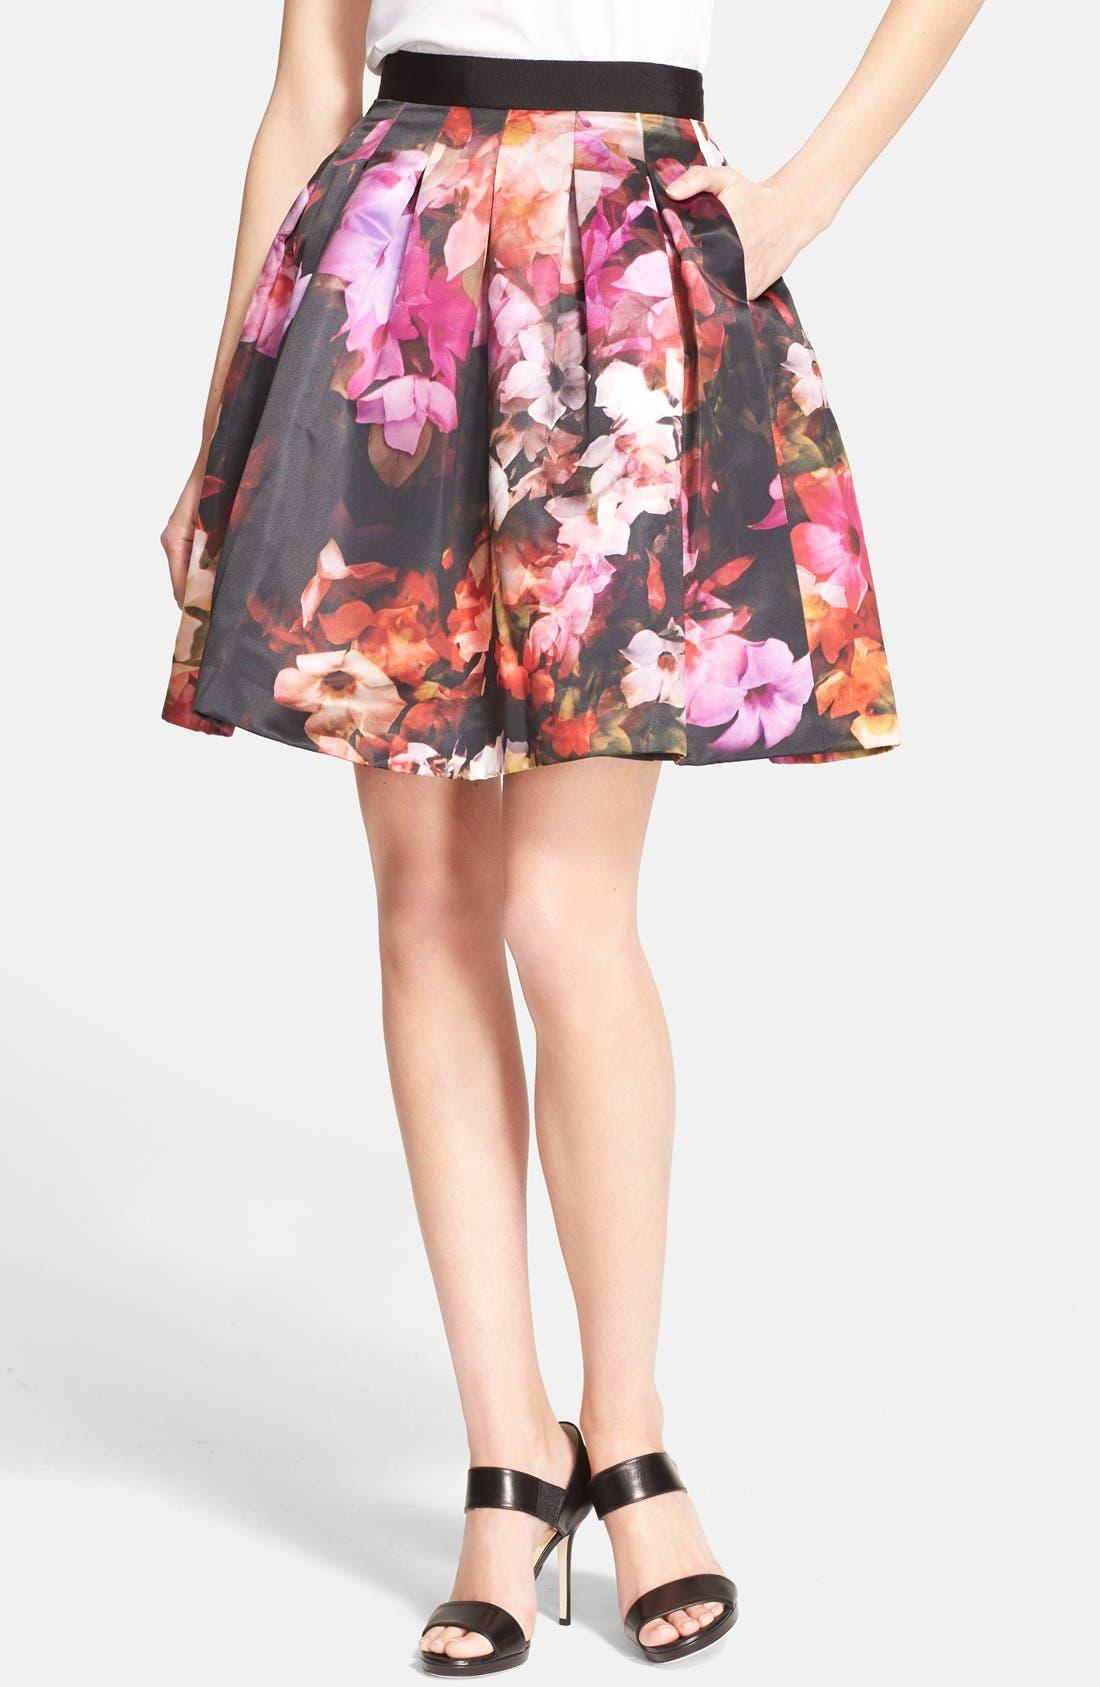 Alternate Image 1 Selected - Ted Baker London 'Abaigh' Floral Print Skirt